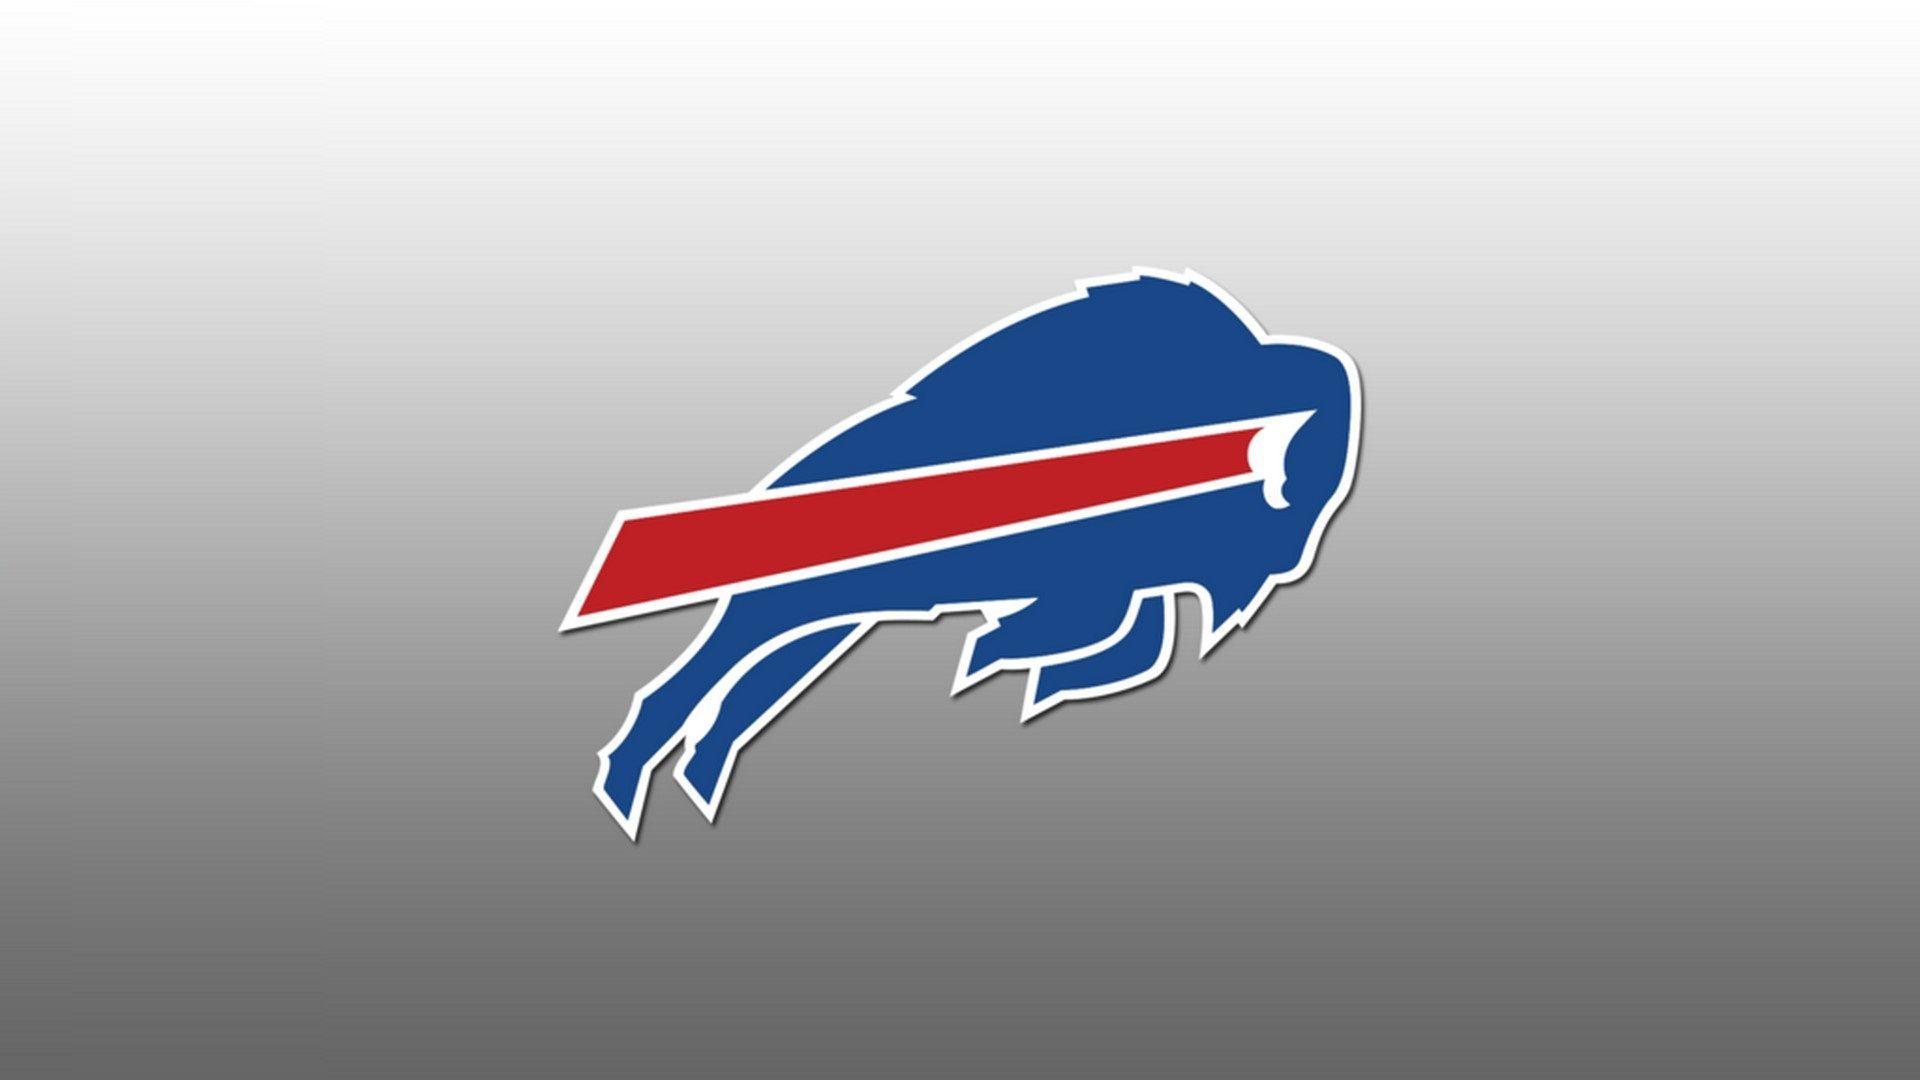 Buffalo Bills Wallpapers Top Free Buffalo Bills Backgrounds Wallpaperaccess